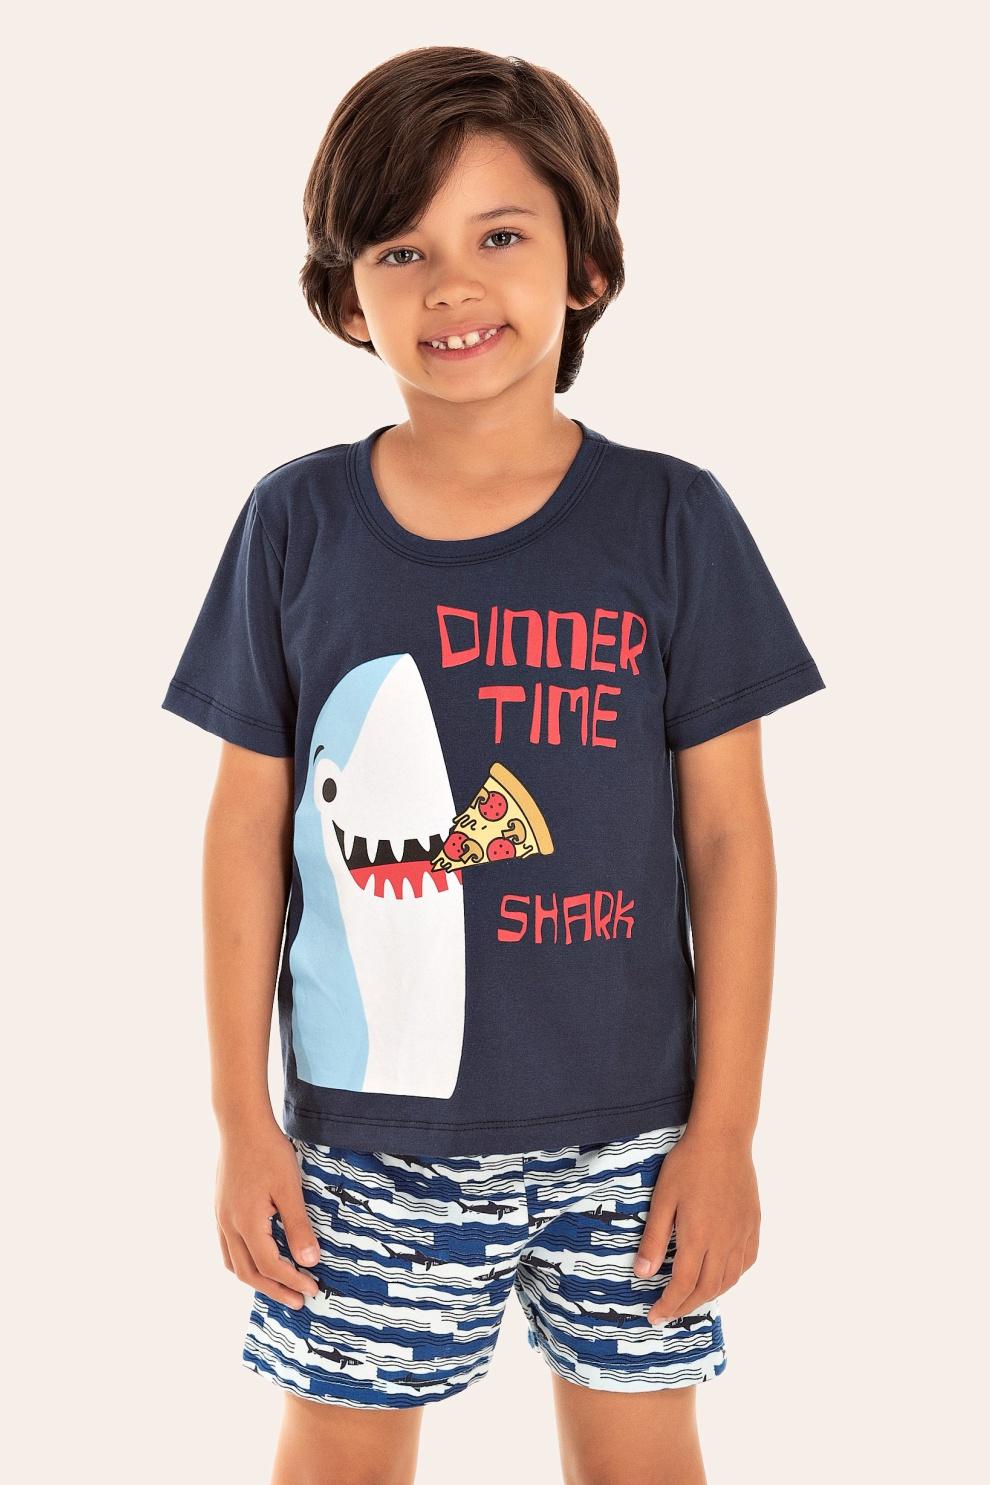 211/M - Pijama Infantil Masculino Dinner Time Shark